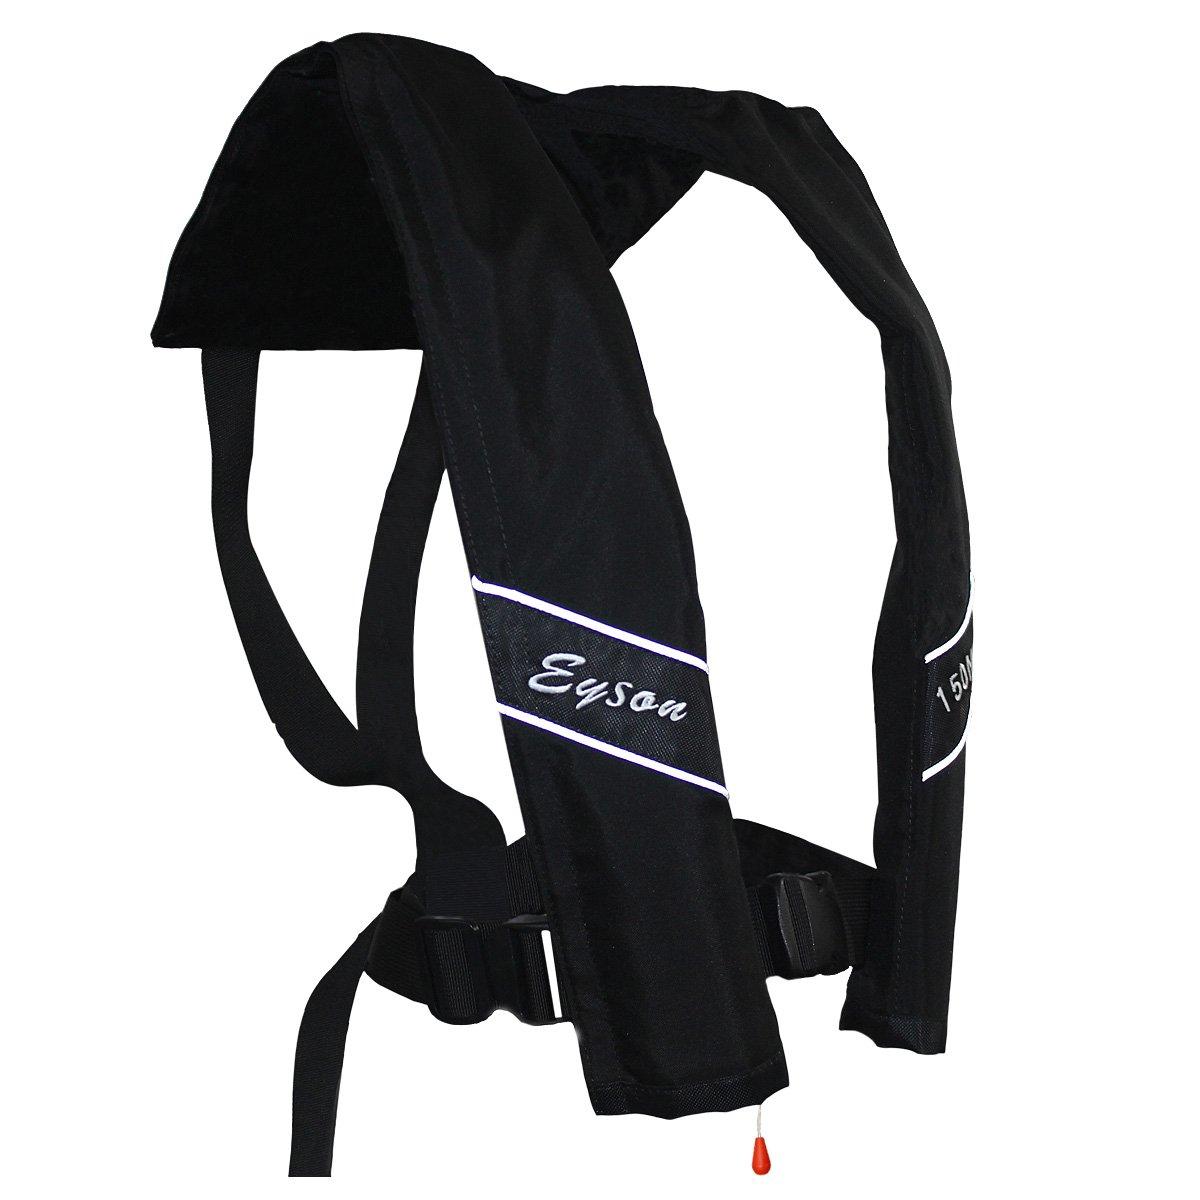 bdccd0a859 Amazon.com   Eyson Slim Inflatable PFD Life Jacket Life Vest Adult  Automatic (Black)   Sports   Outdoors